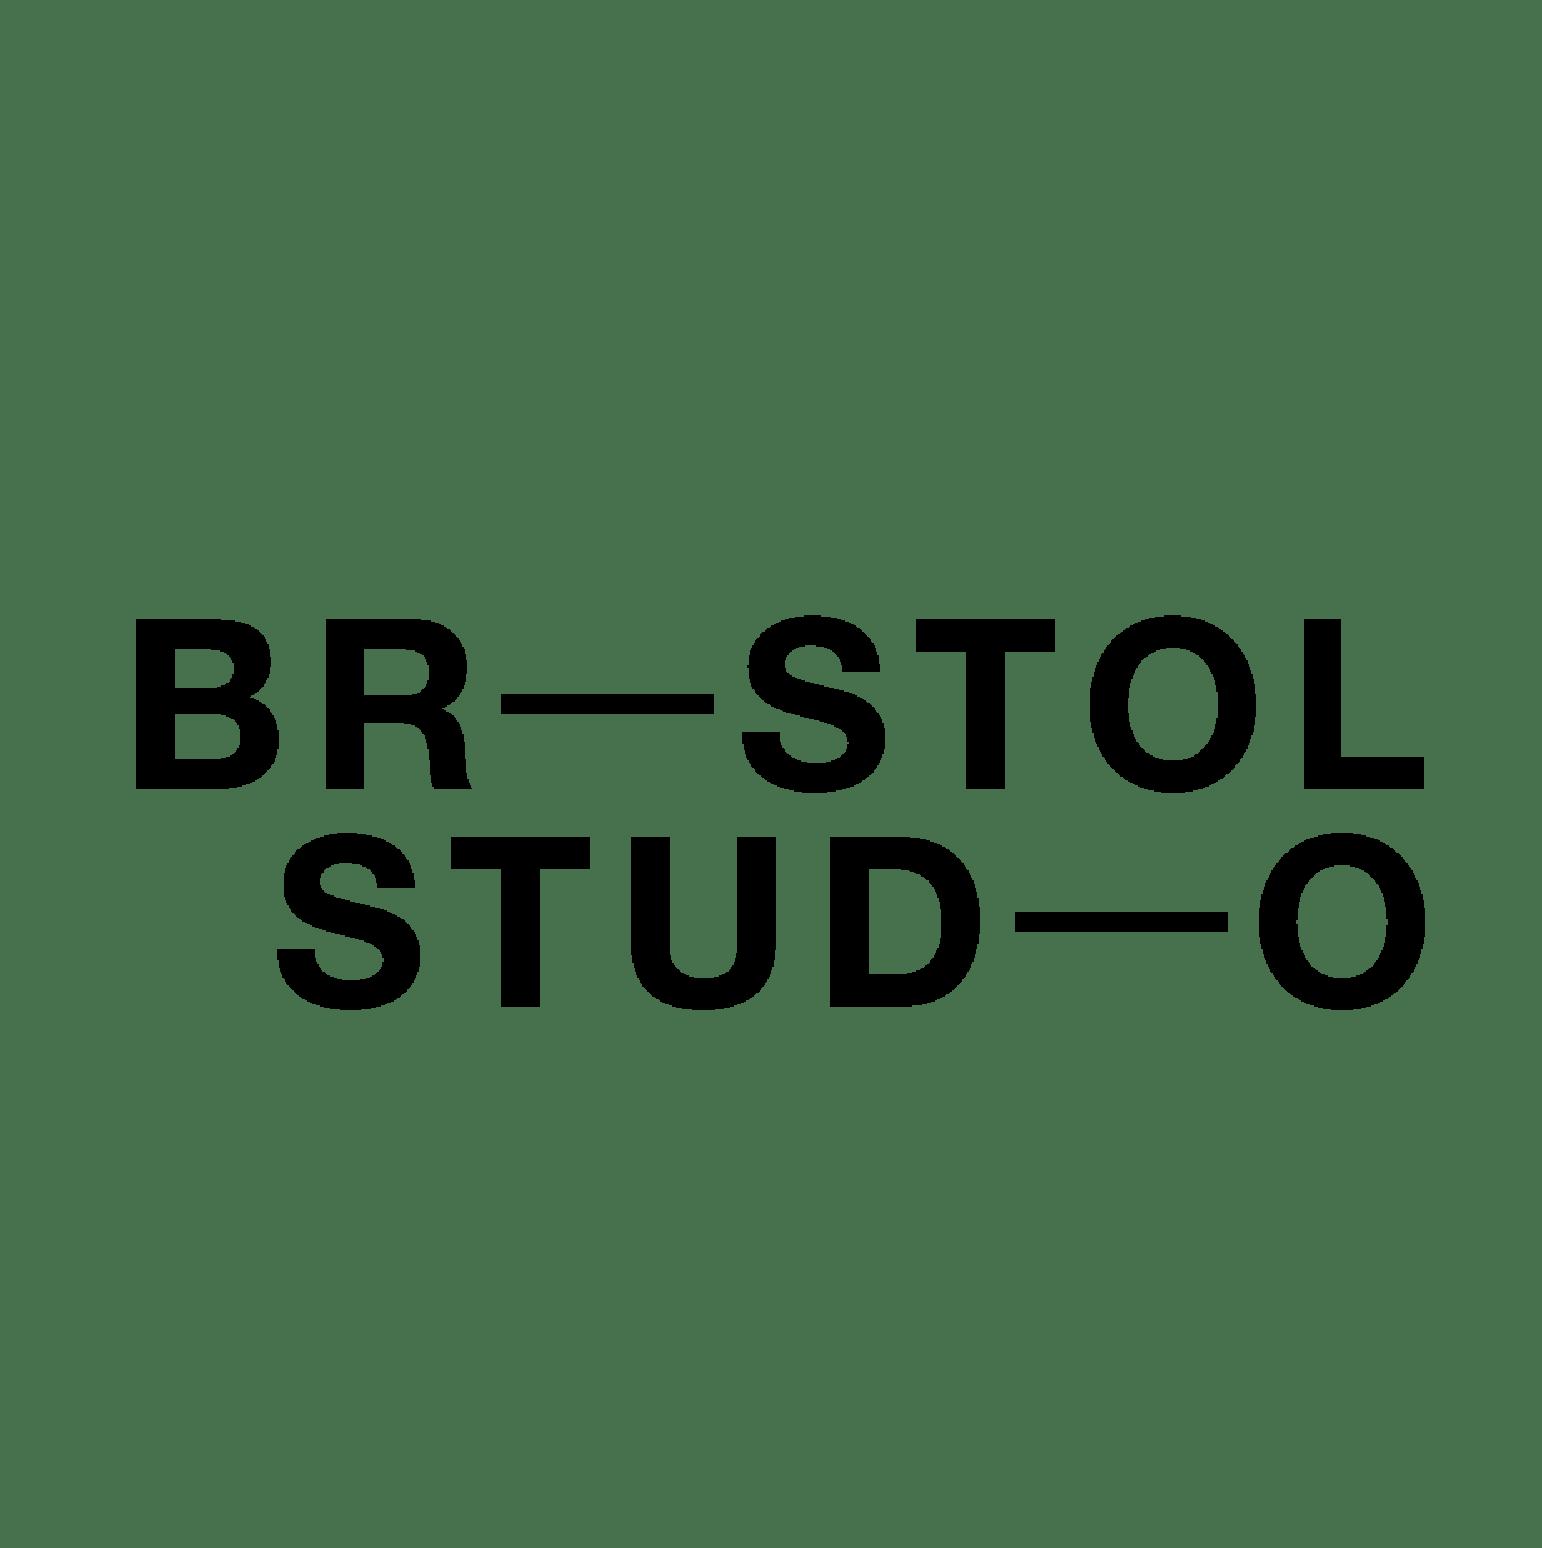 Bristol Studio